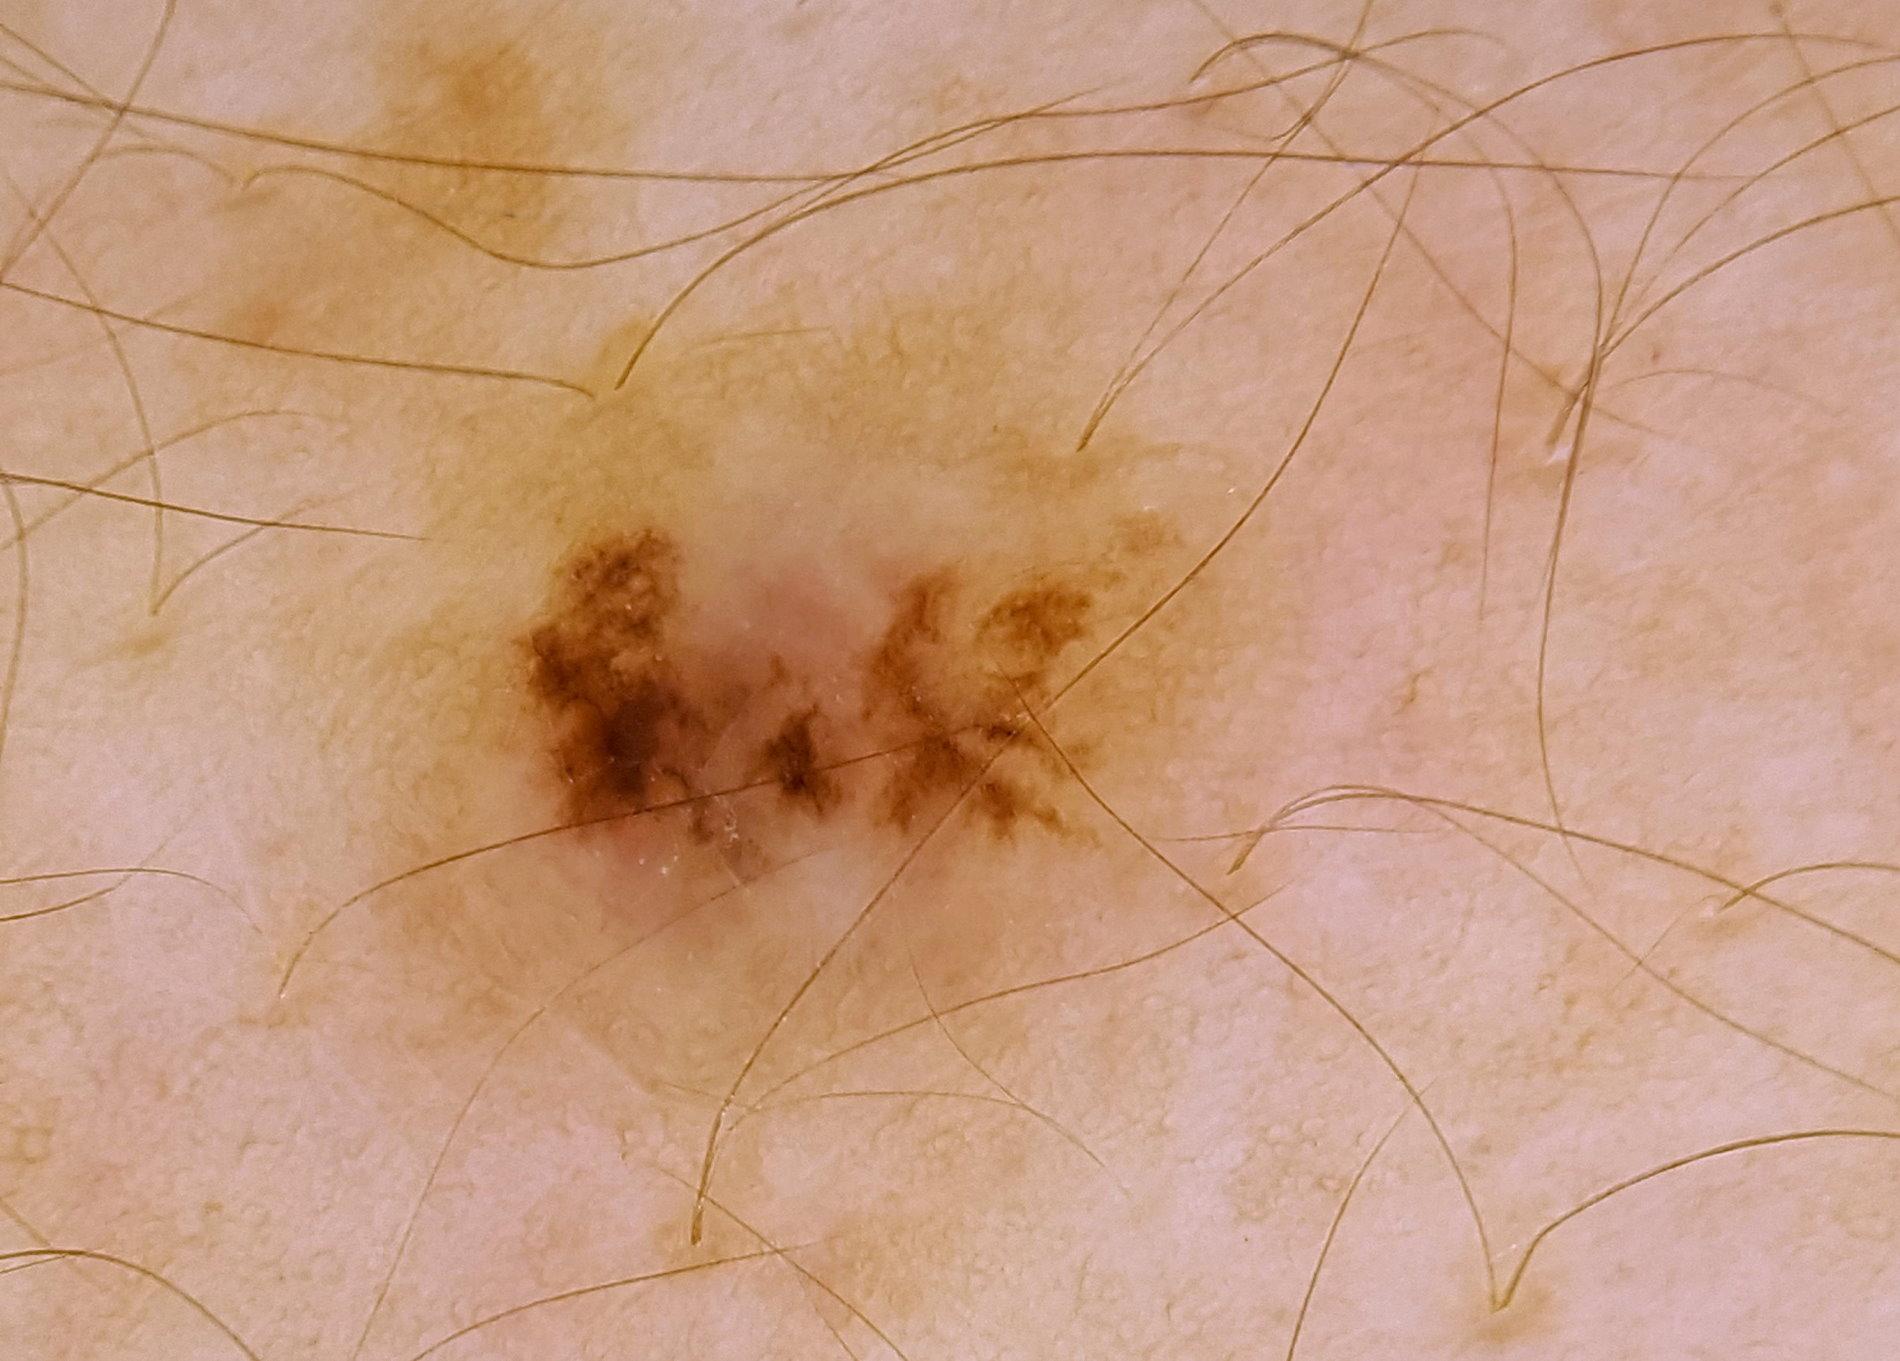 F2 Dermatoscopia